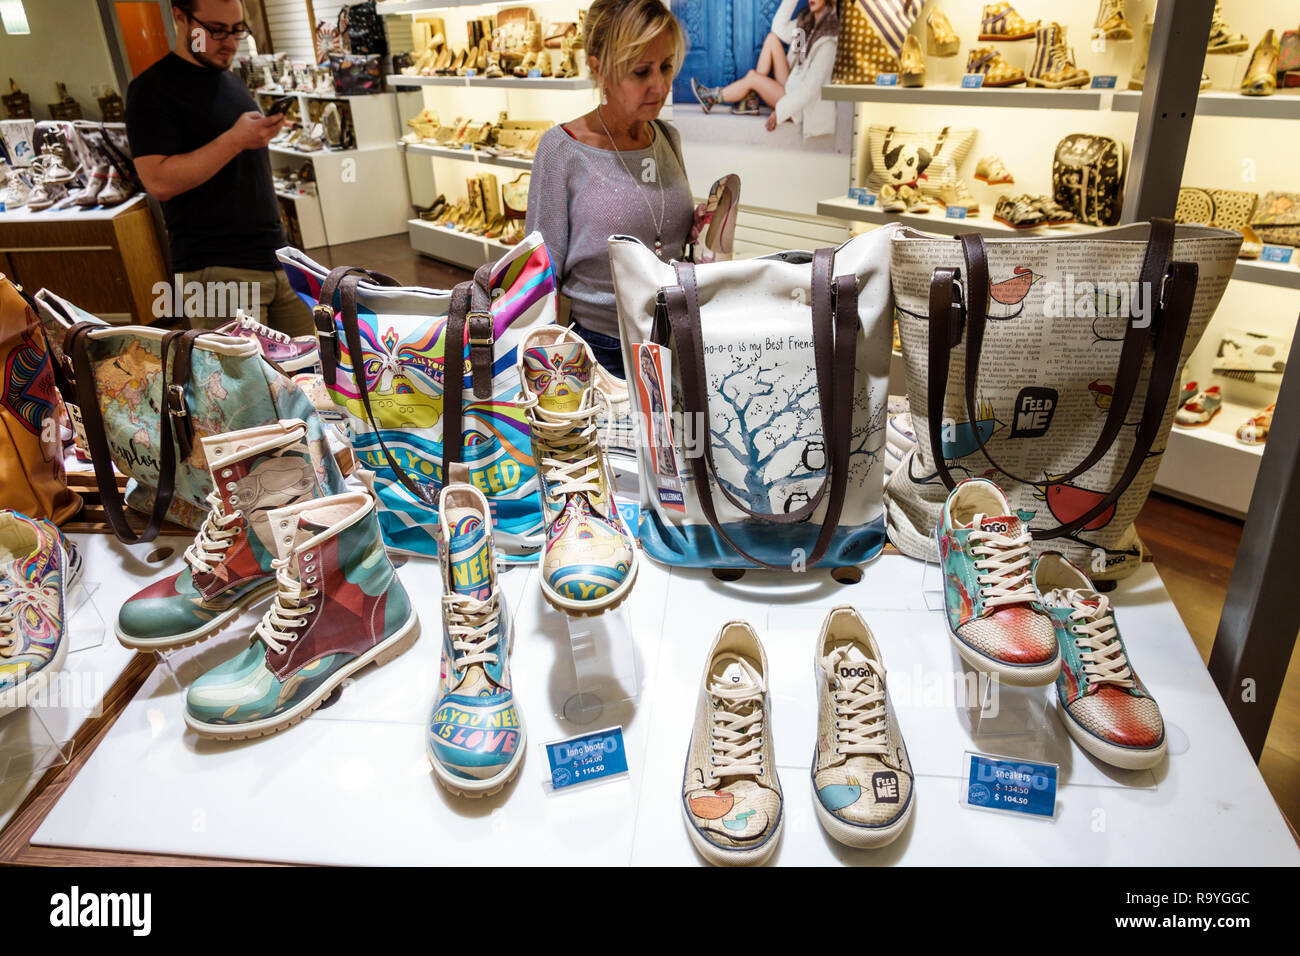 Fort Ft. Lauderdale Florida Sunrise Sawgrass Mills Mall Shopping Dogo Anzeige Verkauf Schuhe Taschen Stockbild